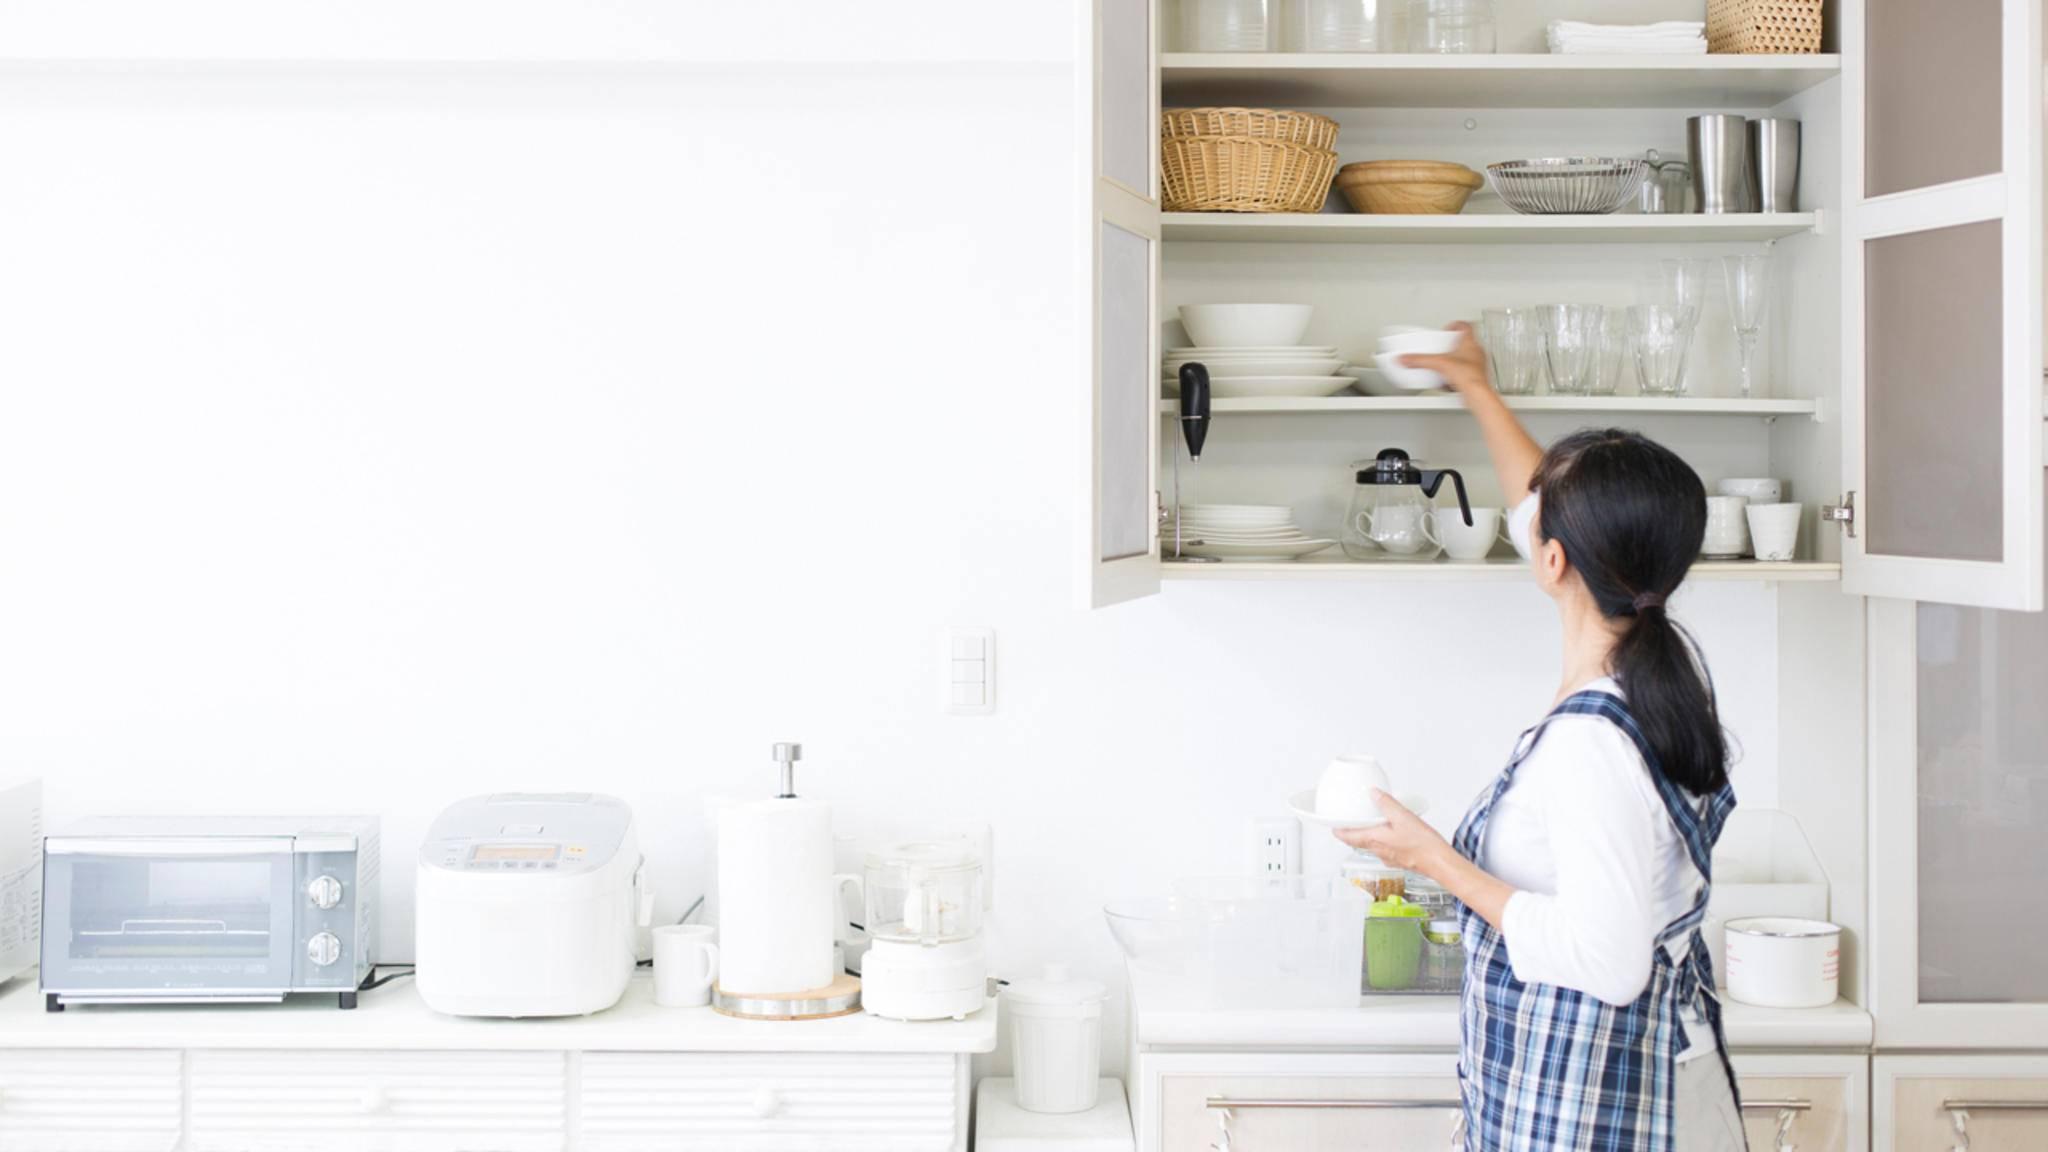 Kuche Organisieren 7 Sinnvolle Ordnungs Tipps